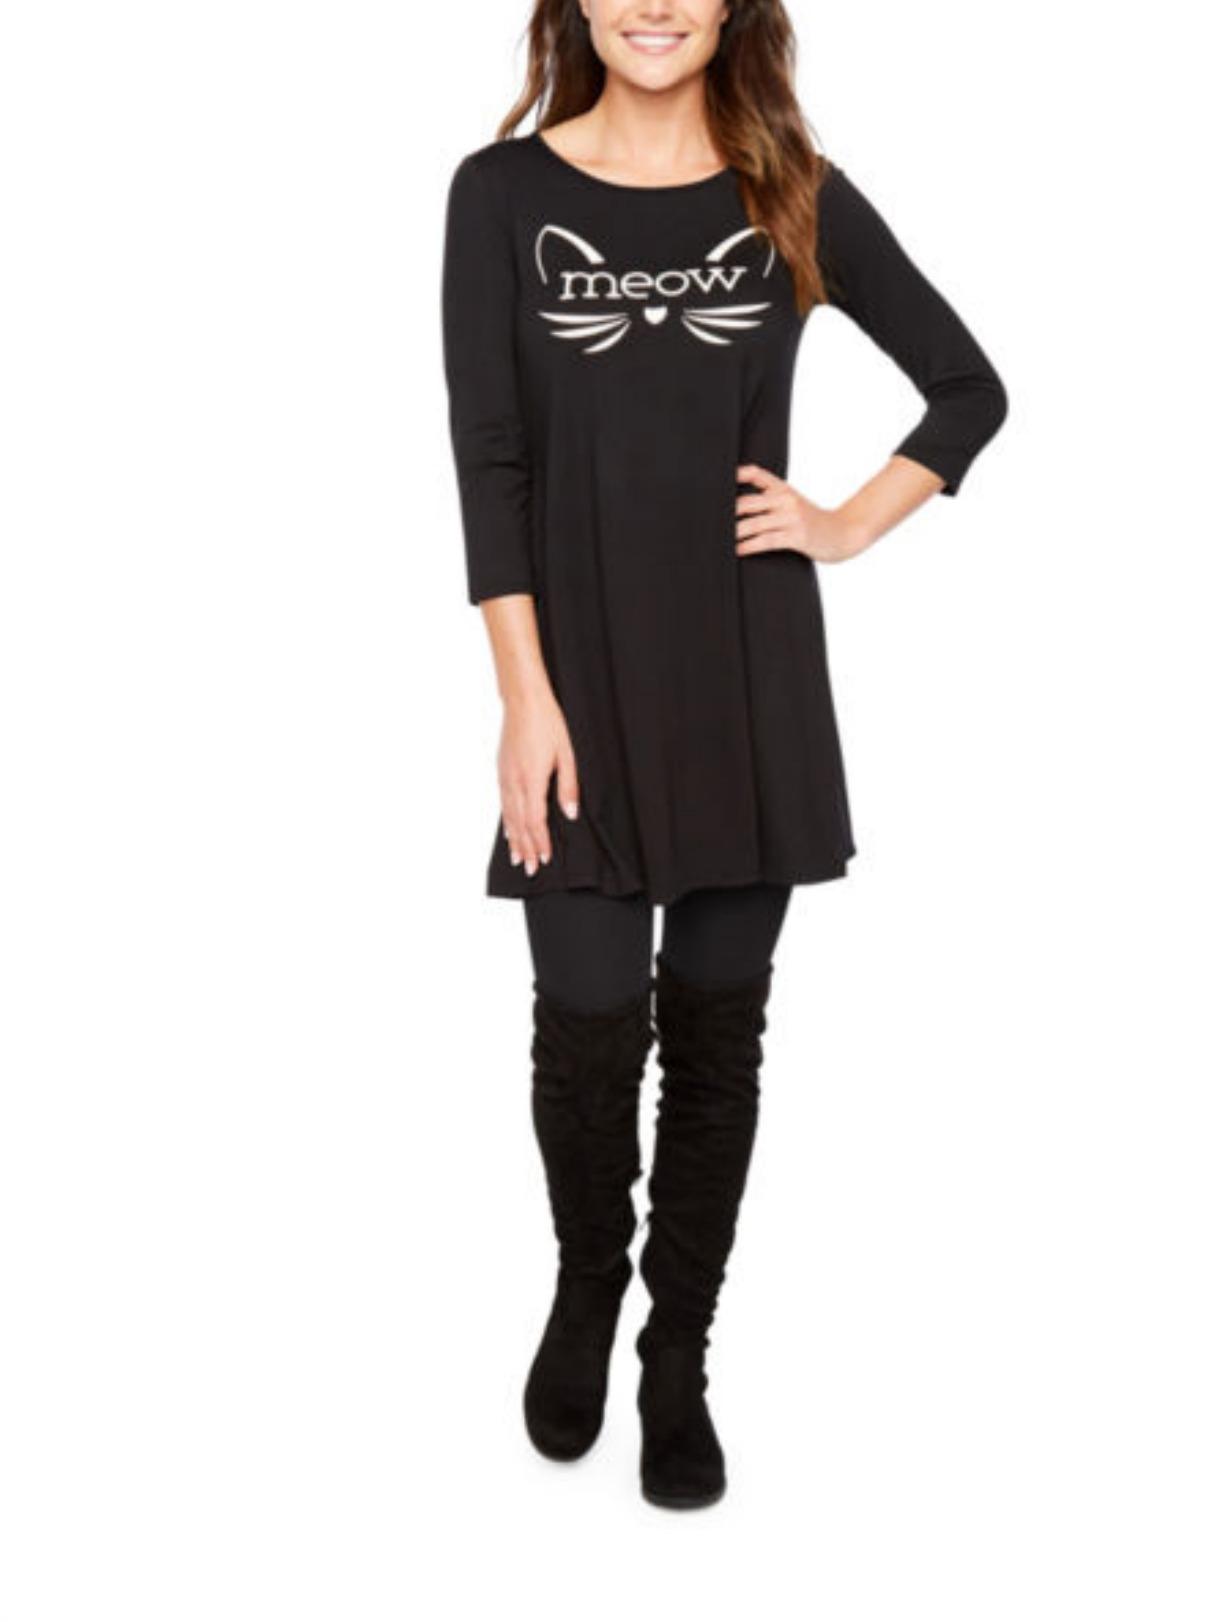 St. John's Bay 3/4 Sleeve Halloween Swing Dress - Black Meow